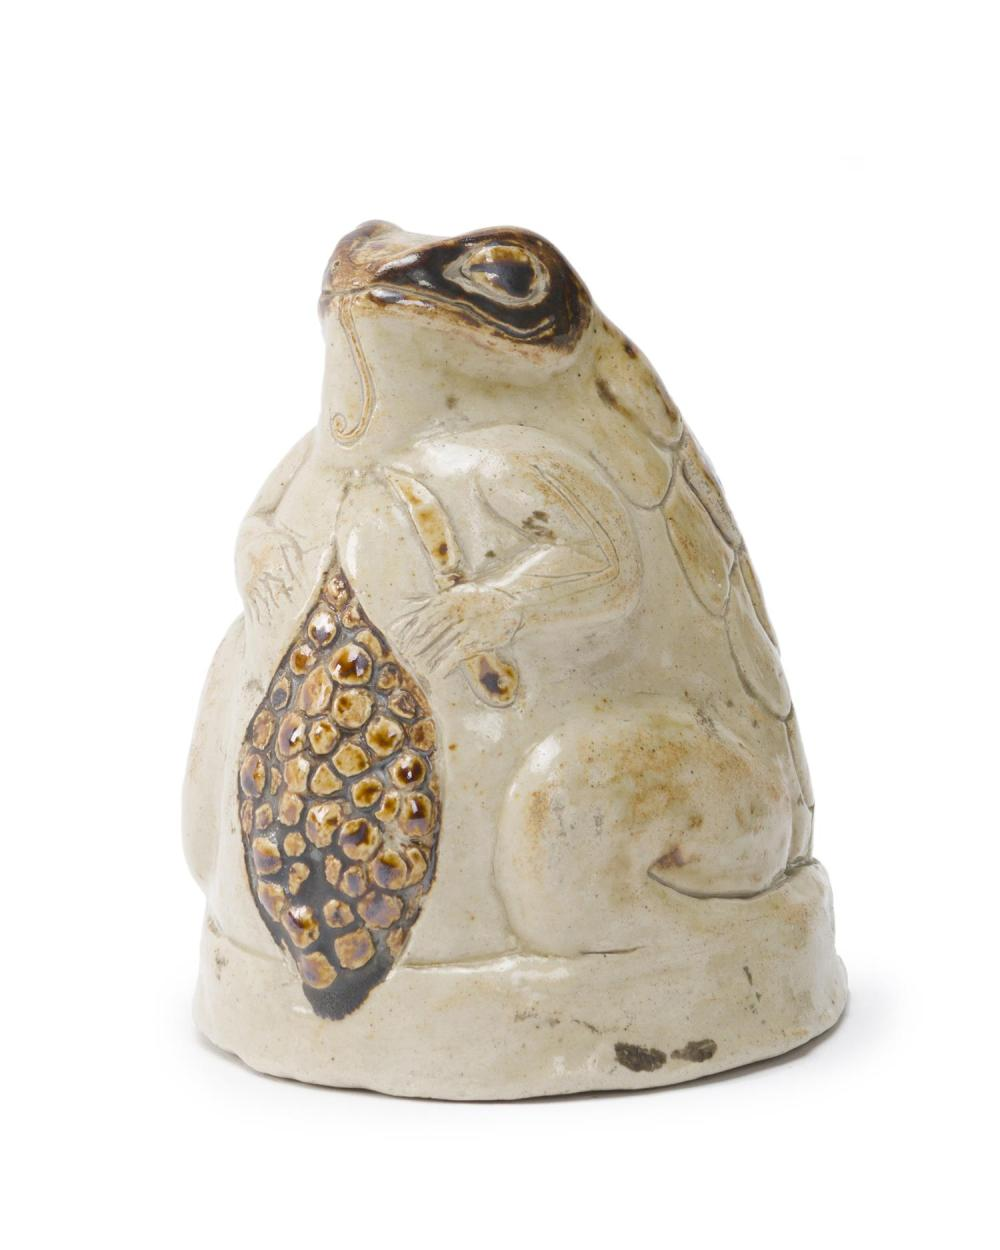 "Francisco Toledo, (1940-2019 Mexican), ""La Rana"", Ceramic with glaze, 4.25"" H x 3.75"" W x 3.125"" D"